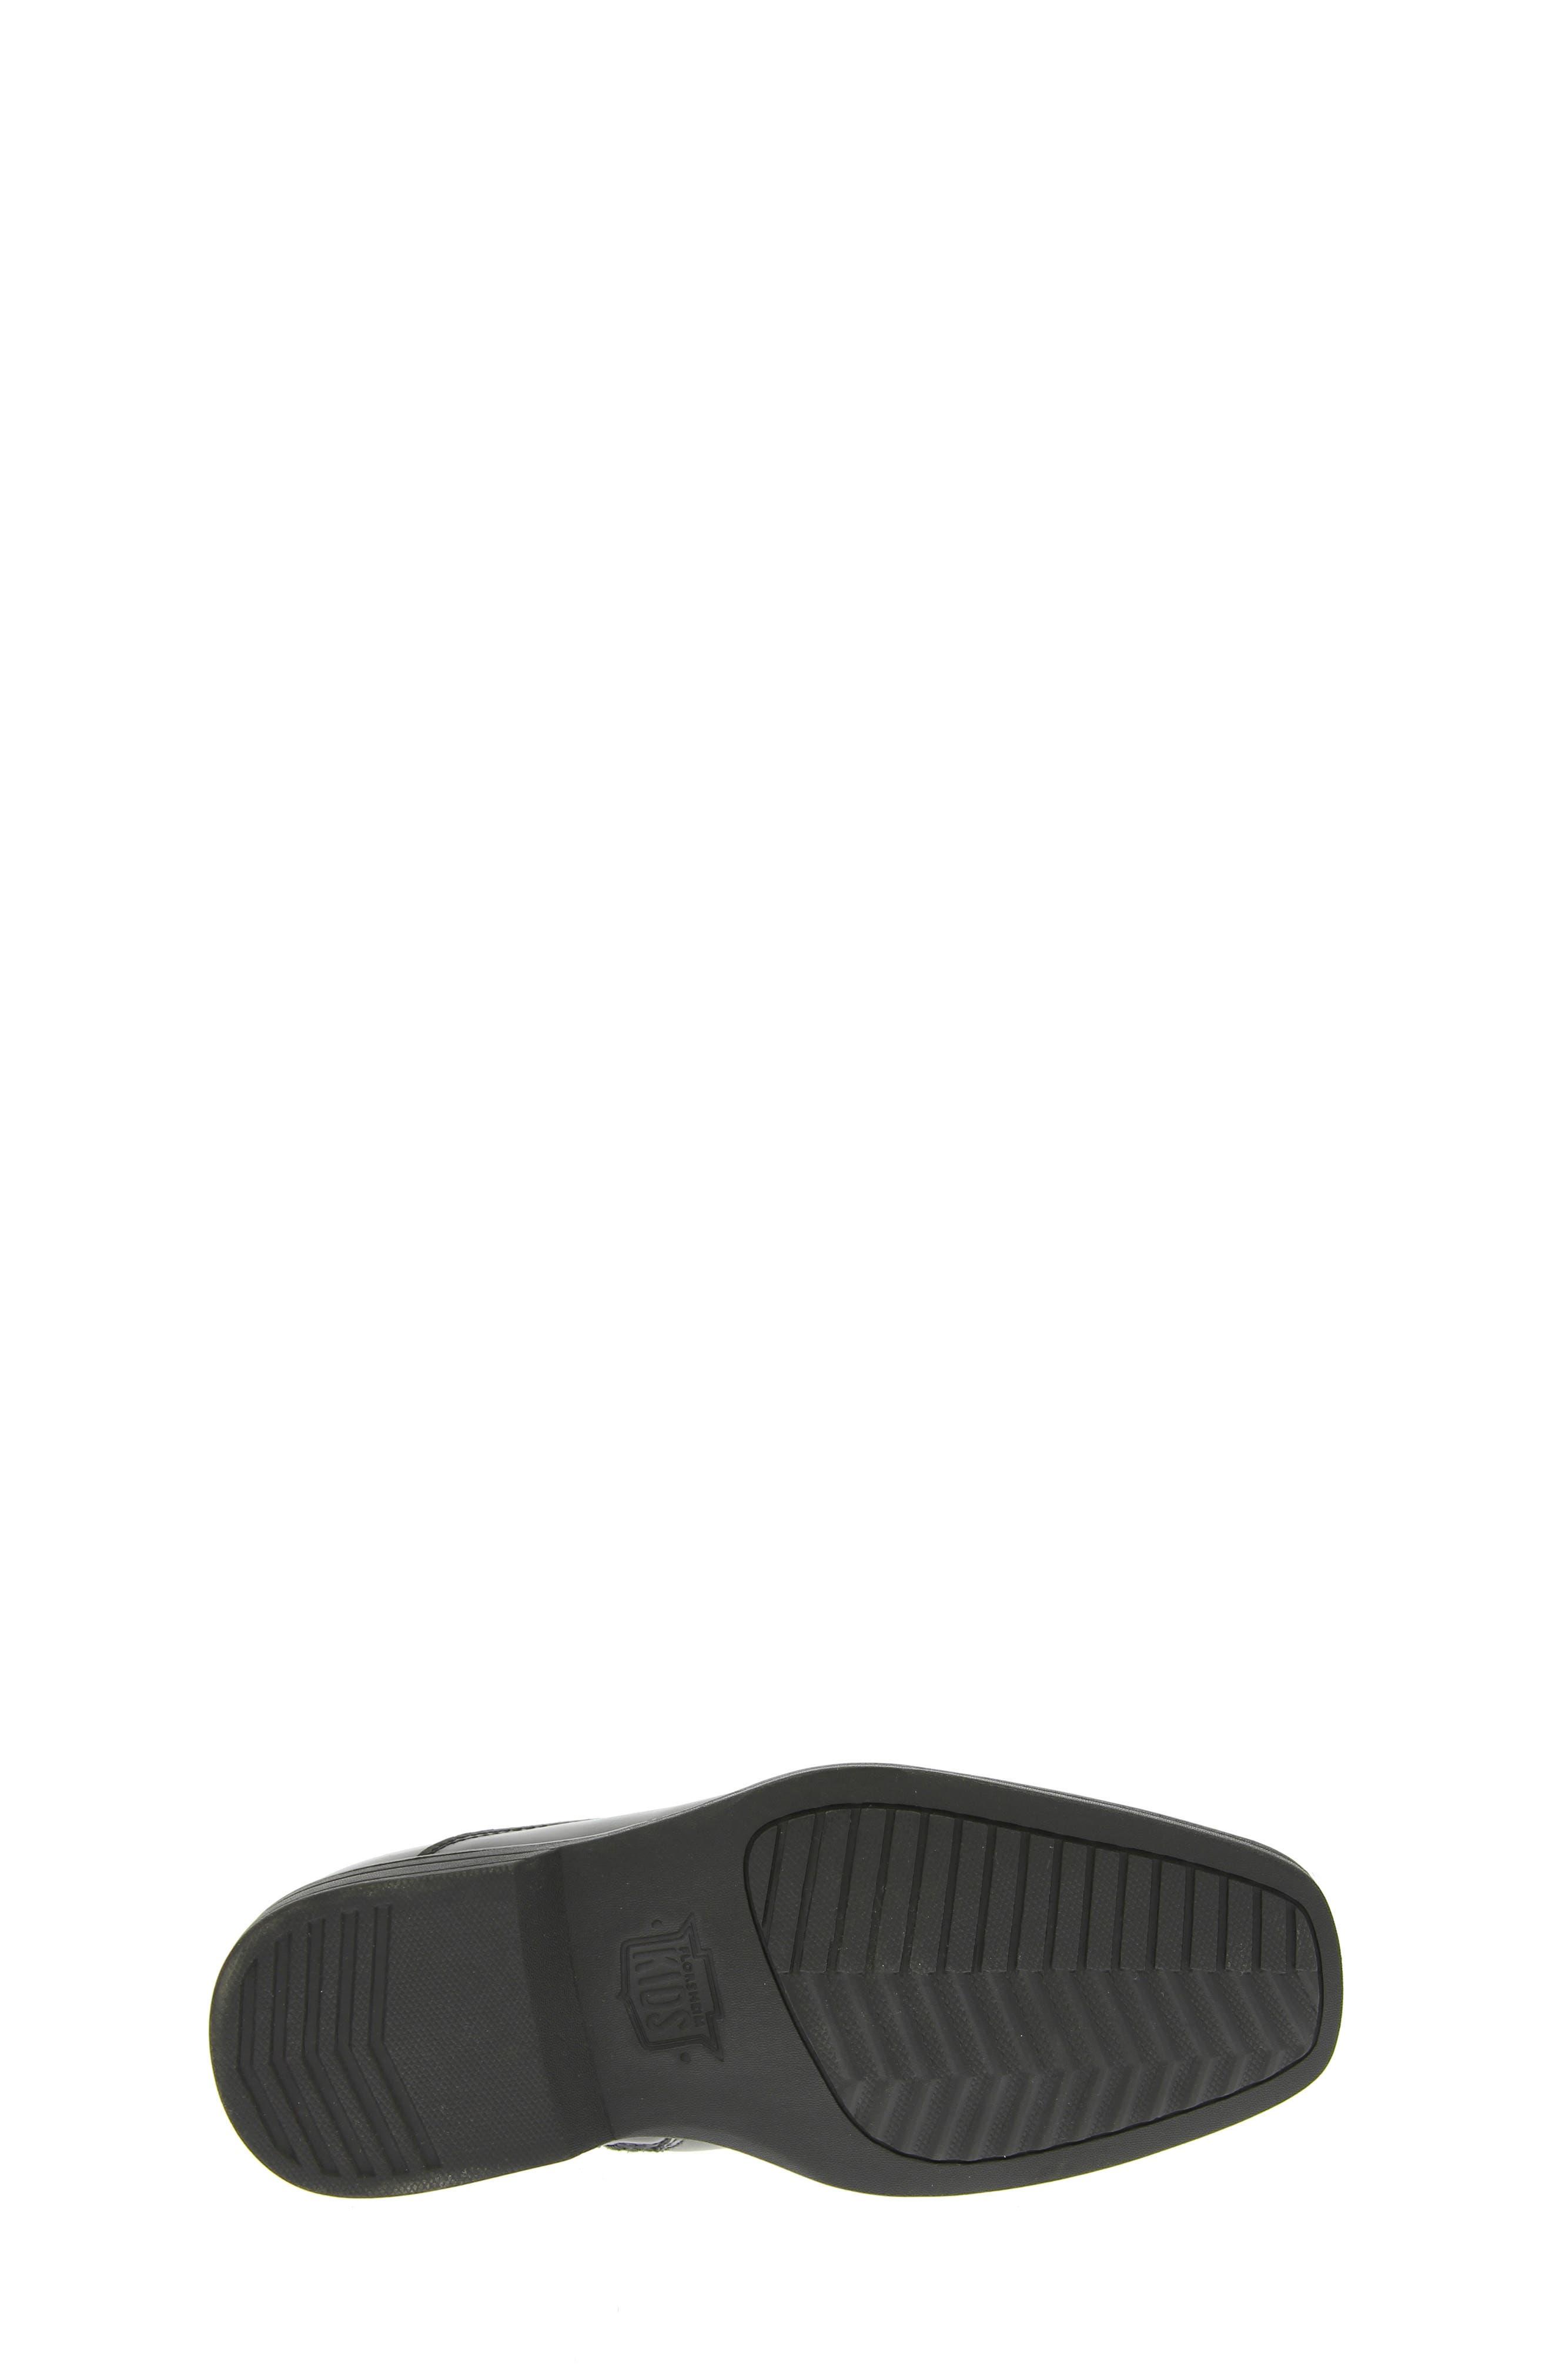 FLORSHEIM, Reveal Chelsea Boot, Alternate thumbnail 9, color, BLACK